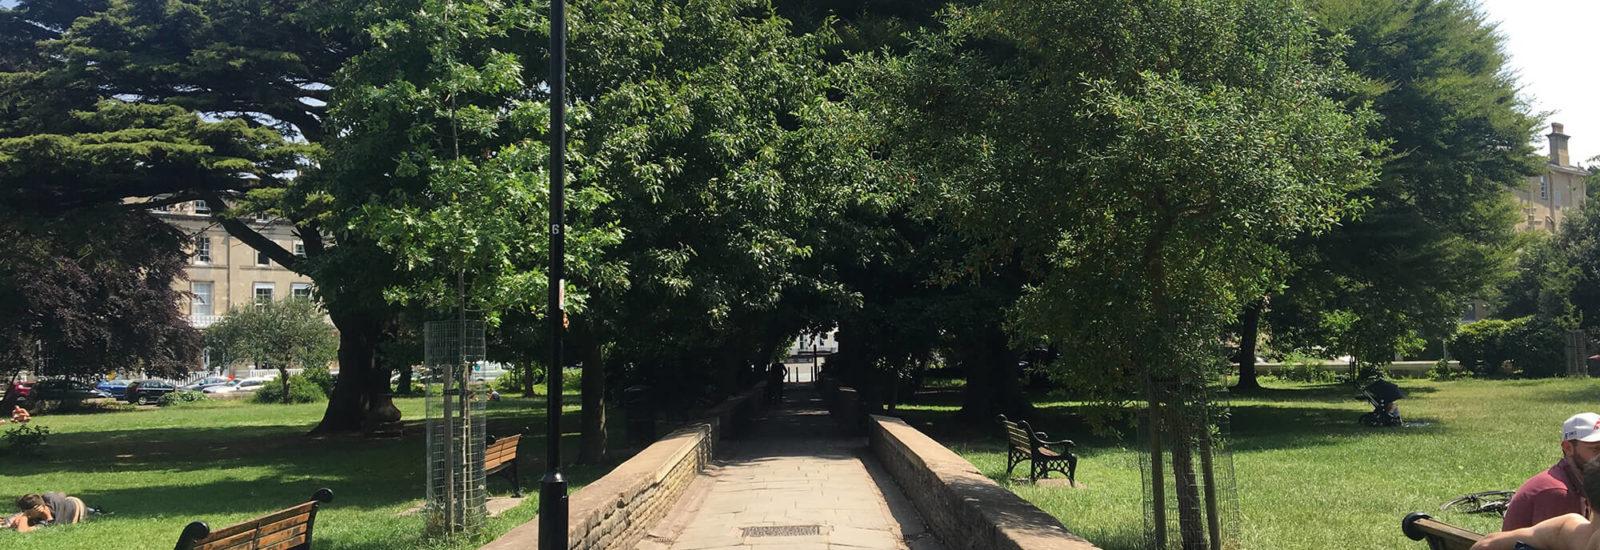 Image of Victoria Square